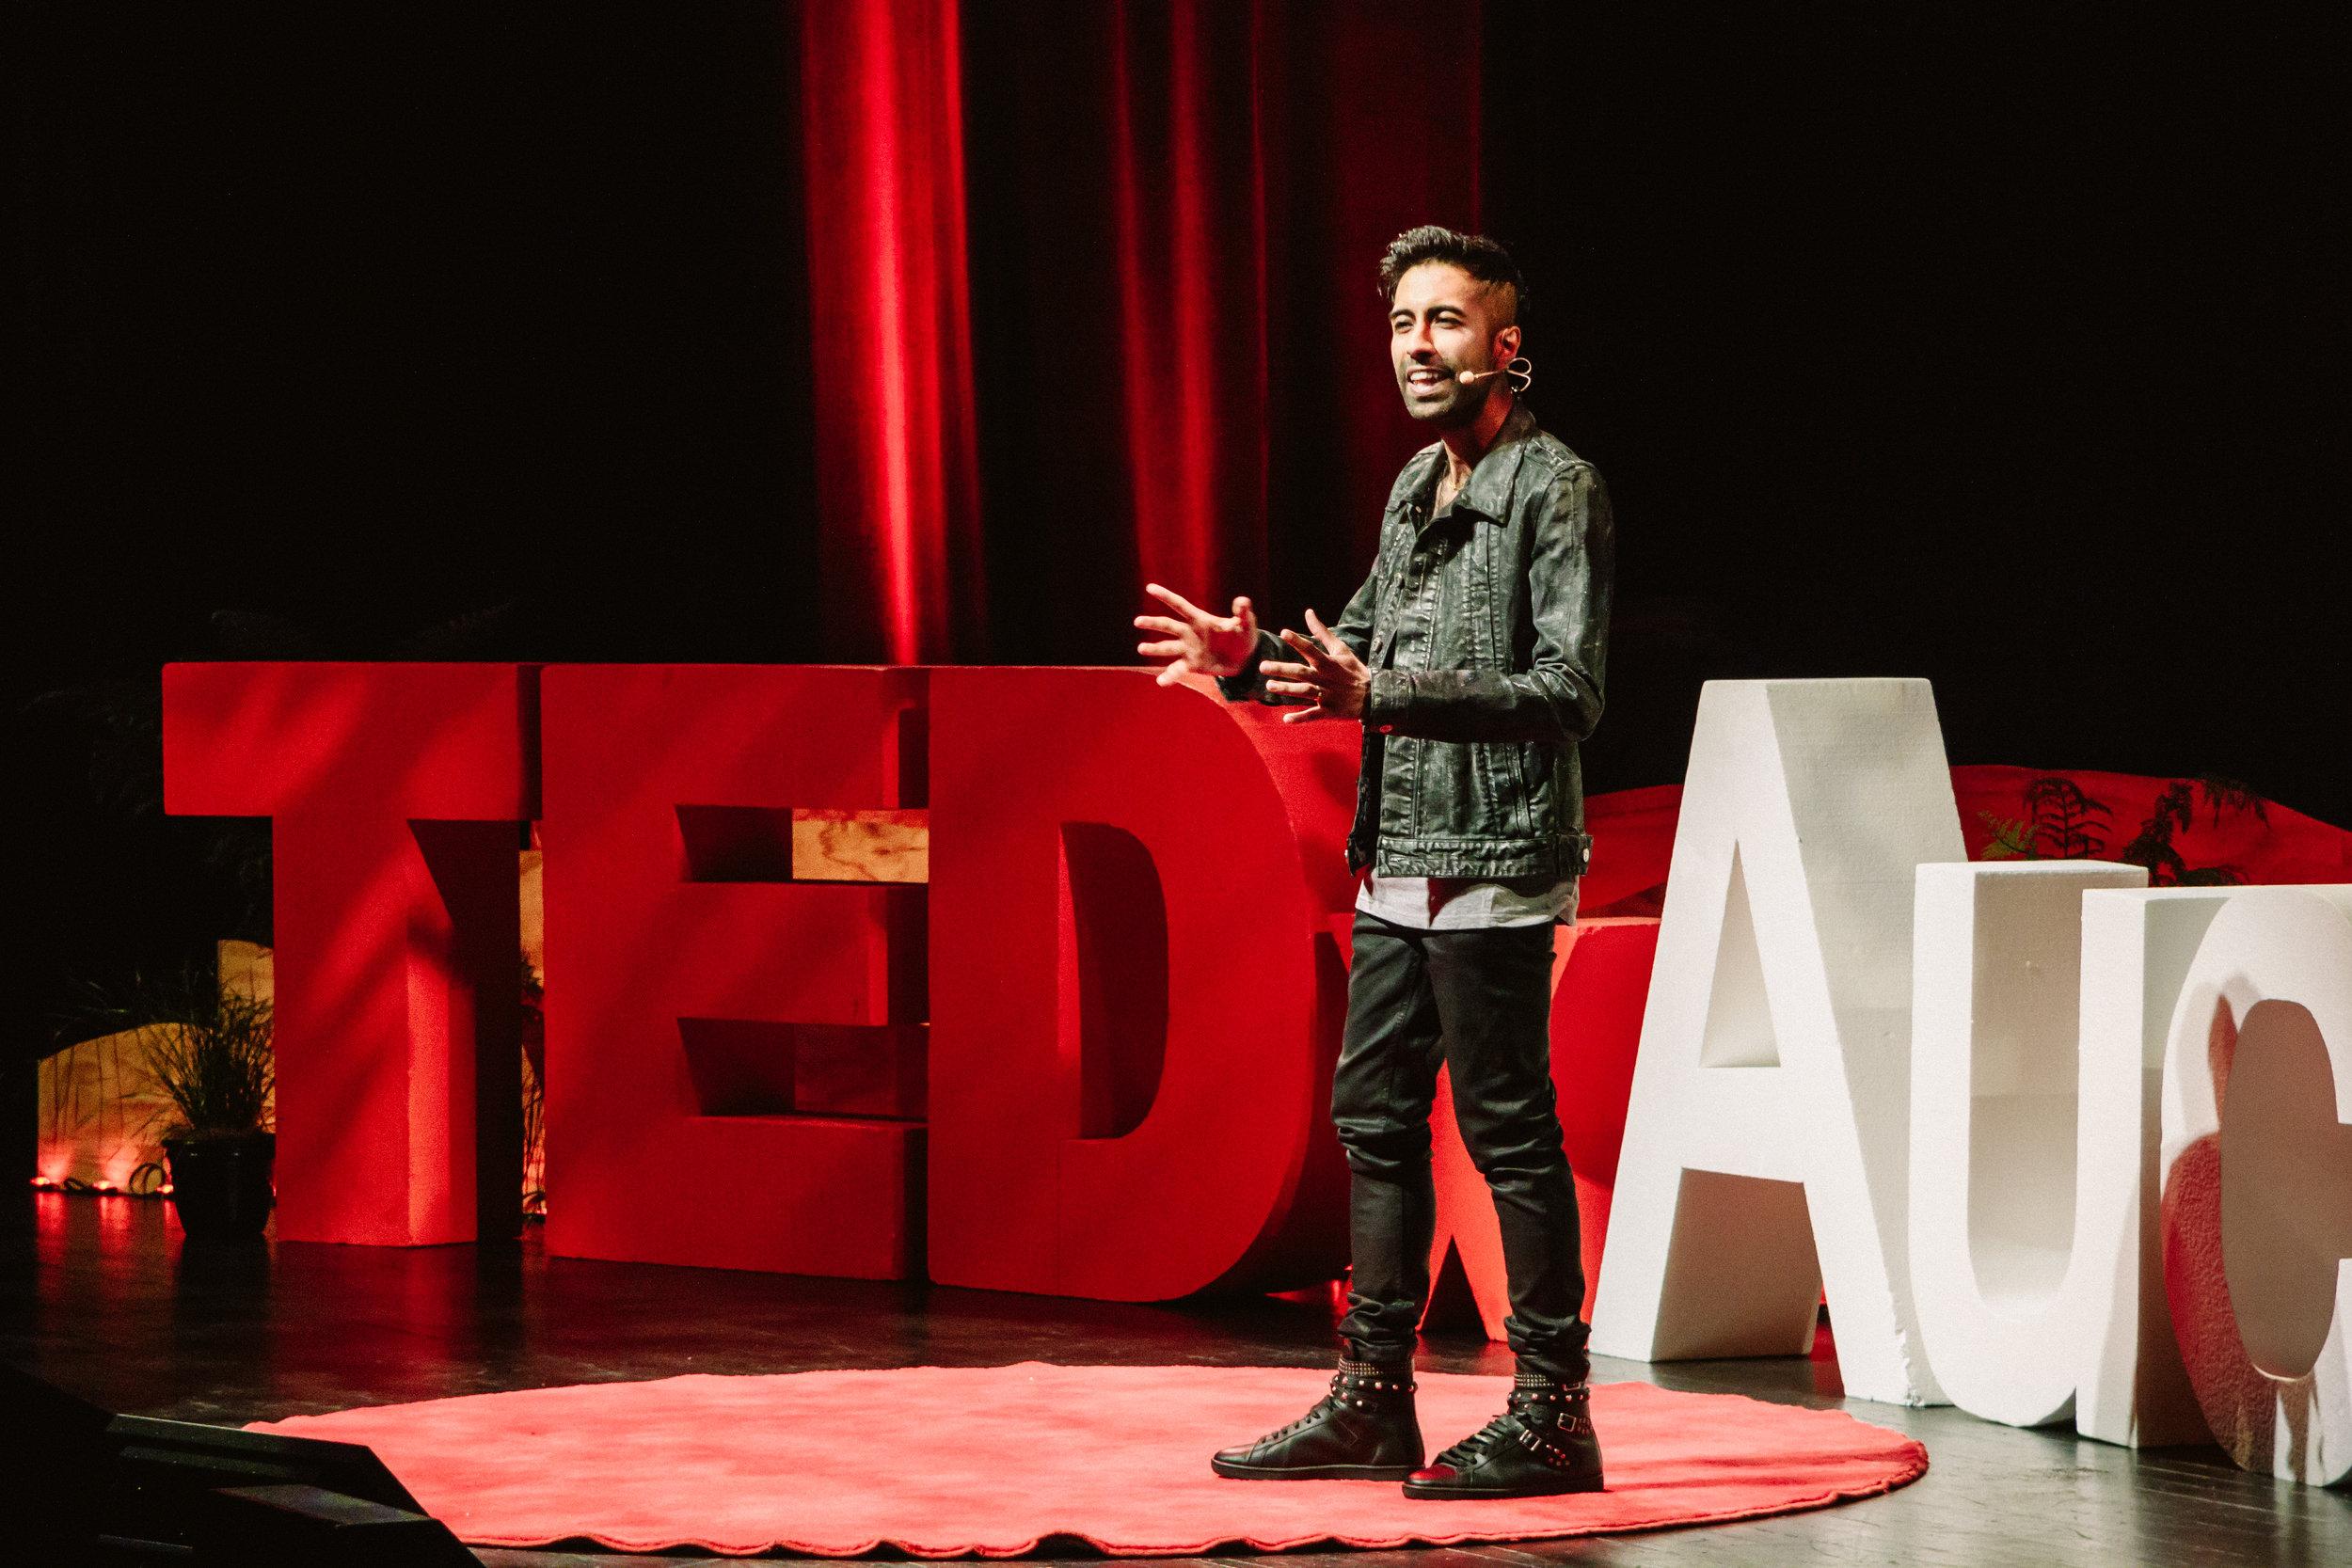 TED_Day1_Rain_IMG_2032.jpg